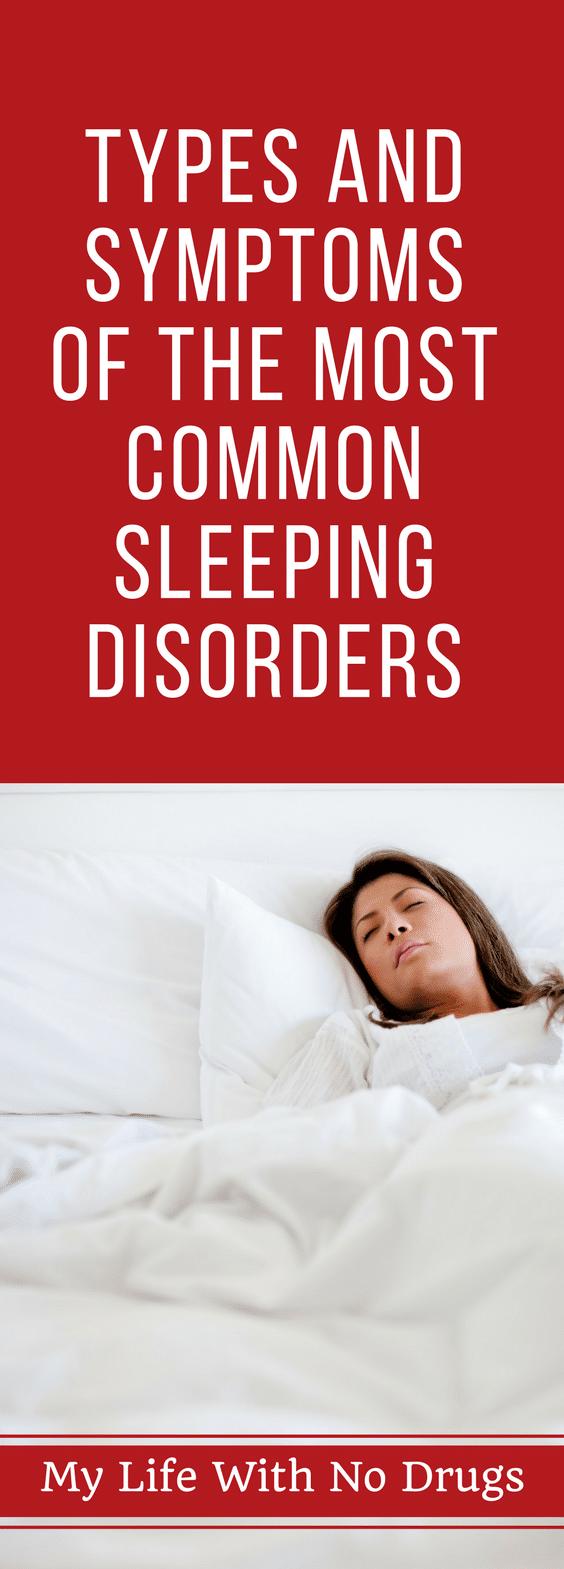 Types and #symptoms Of The Most #common #sleeping #disorders #sleep #insomnia #sleepapnea #narcolepsy #disruptedsleeping #commondenominator #commonsense #knowledge #sense #commonpeople